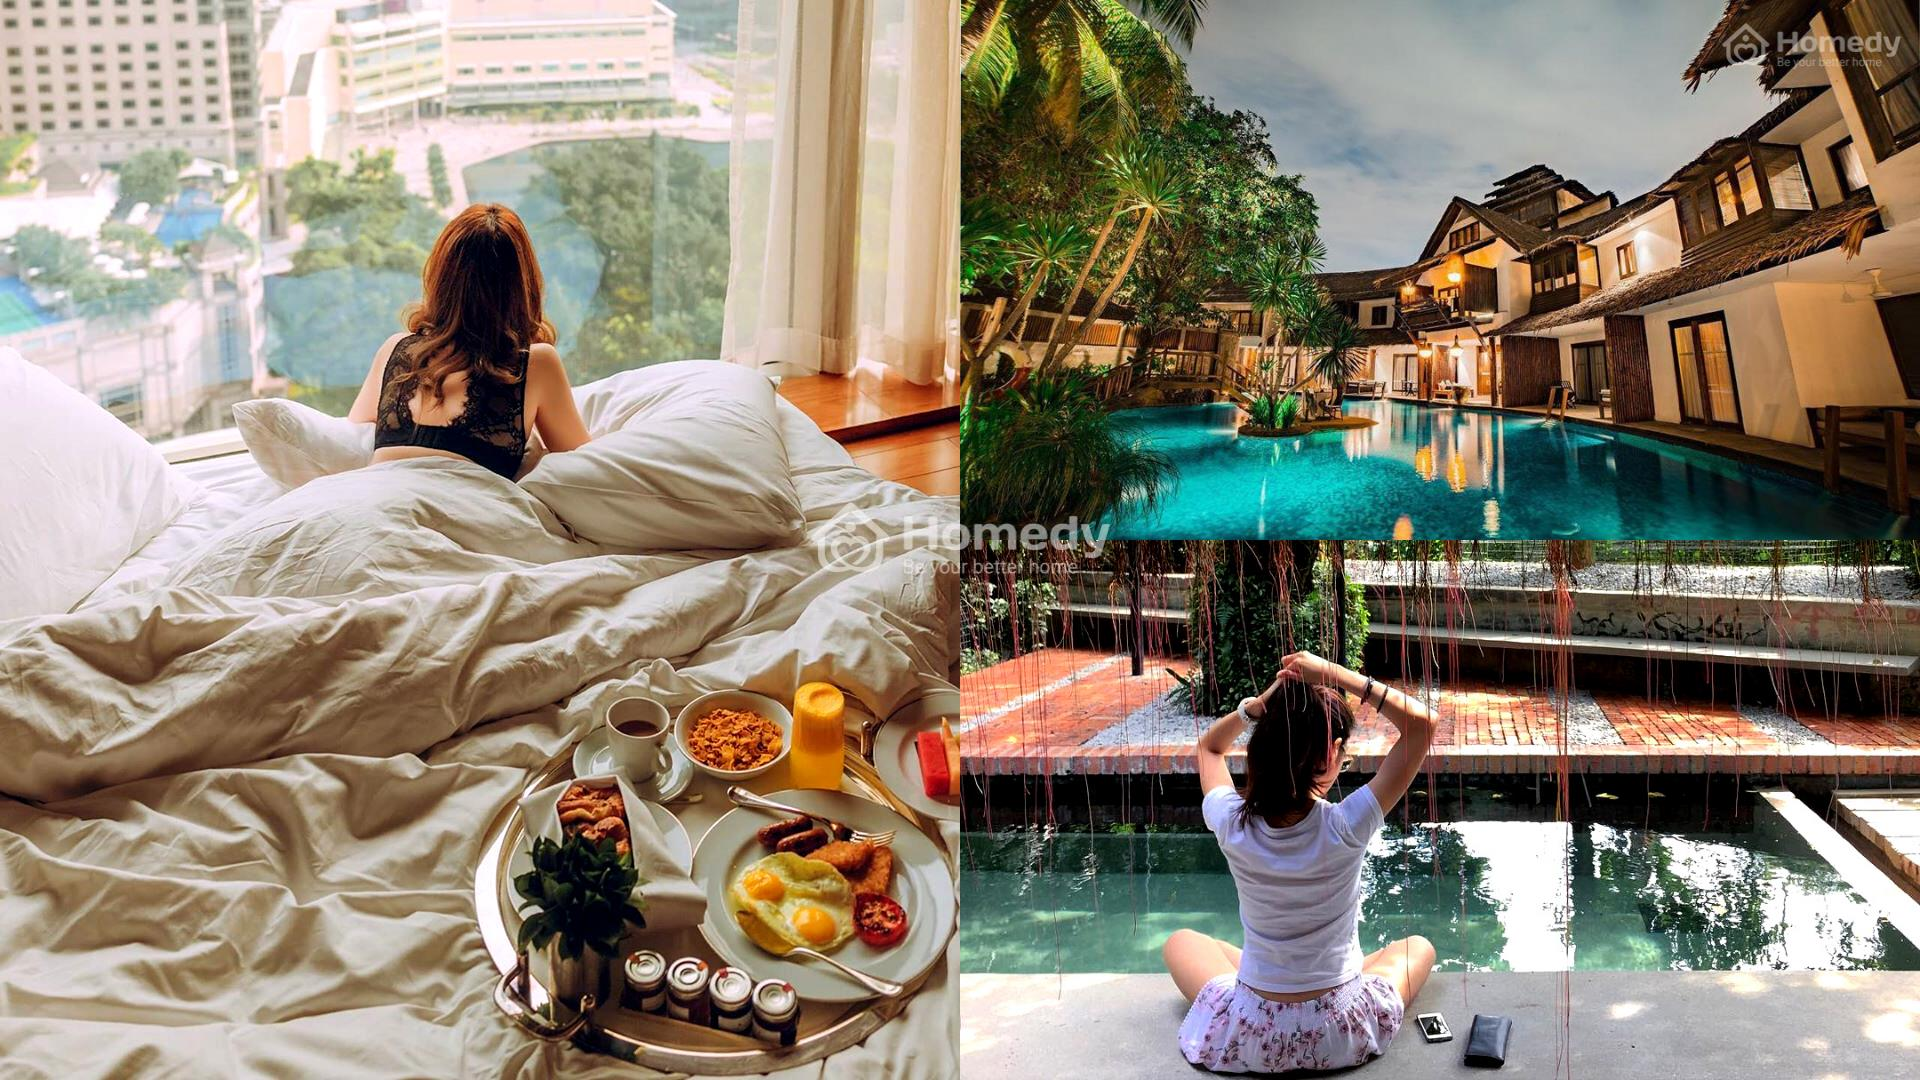 Xu hướng du lịch cuối tuần staycation